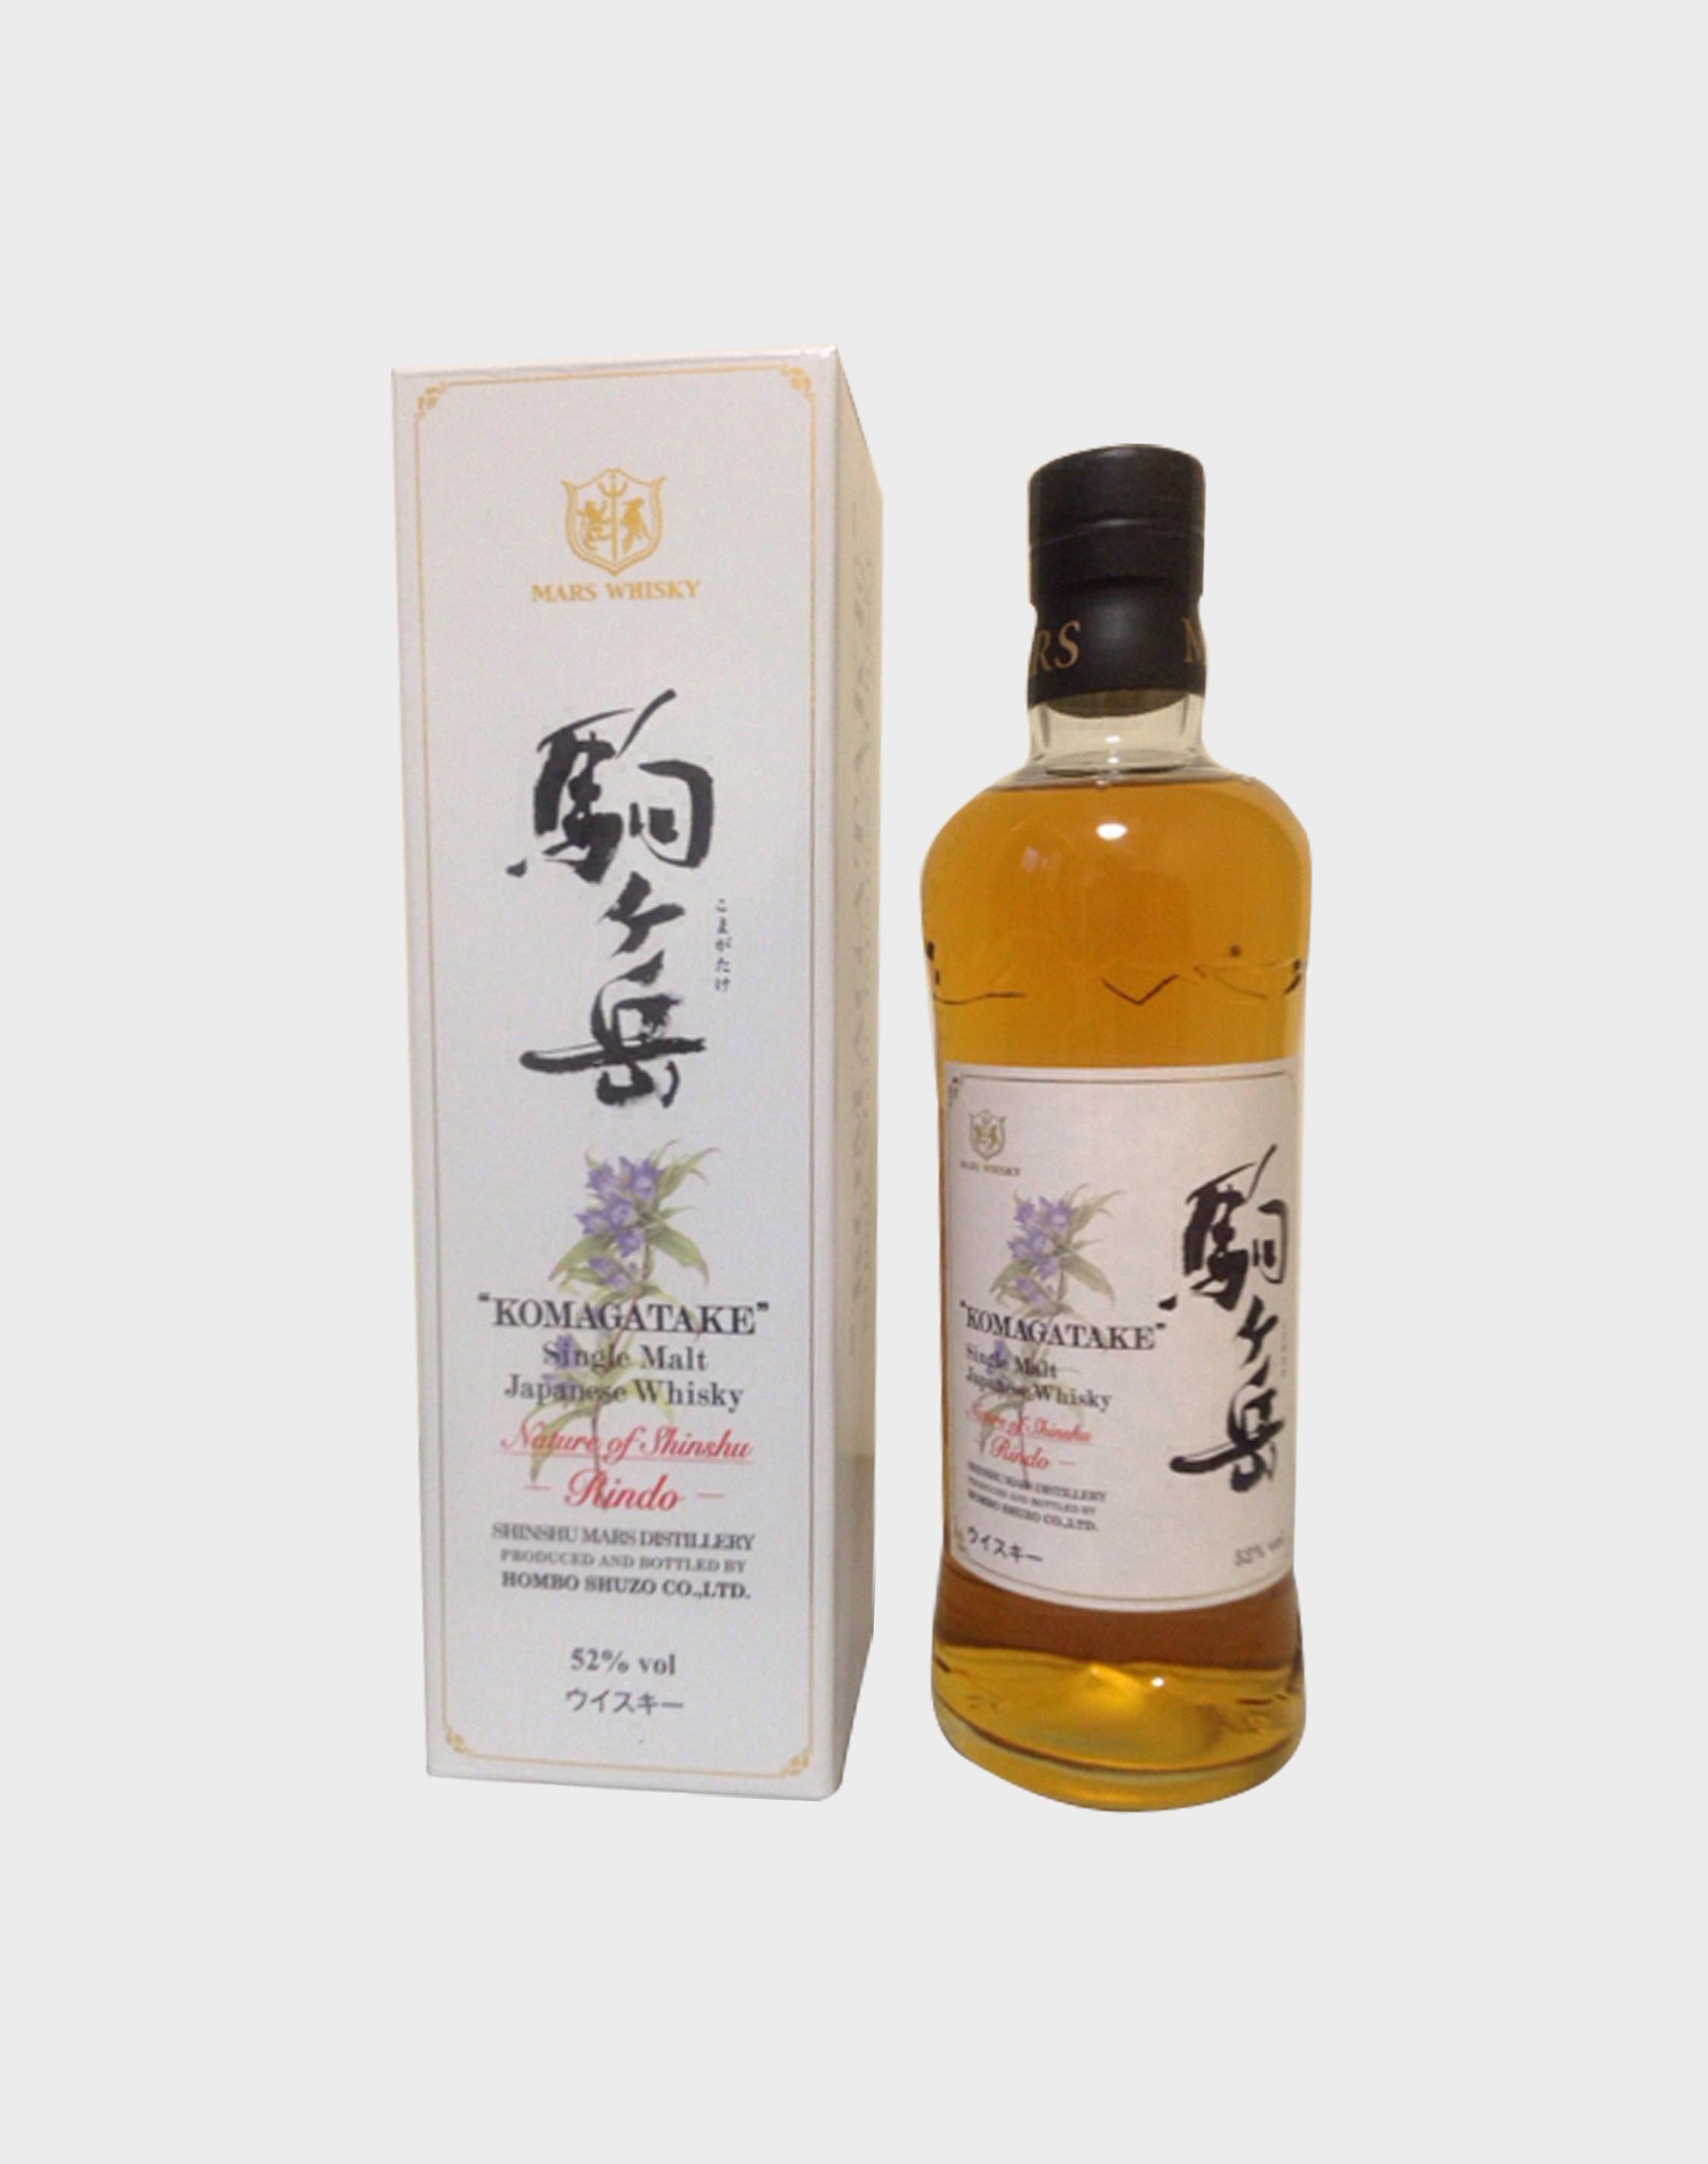 Komagatake whisky rindo